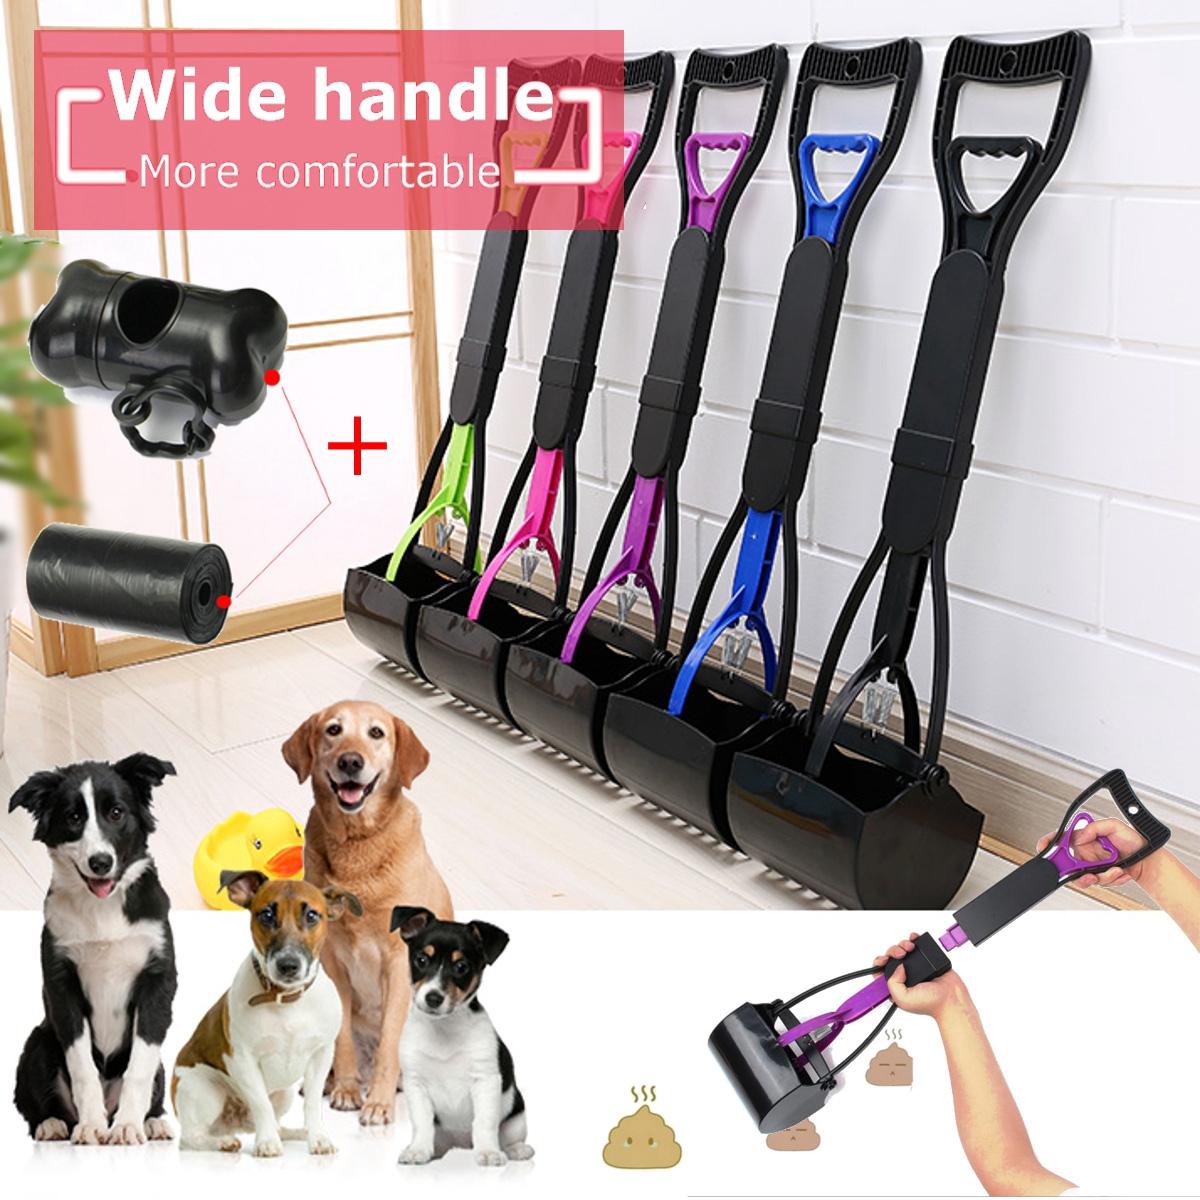 Pet Cat Dog Pooper Scooper Plastic Jaw Poop Scoop Pick Up Easy Clean Waste Shovel Long Handle + Plastic Bag